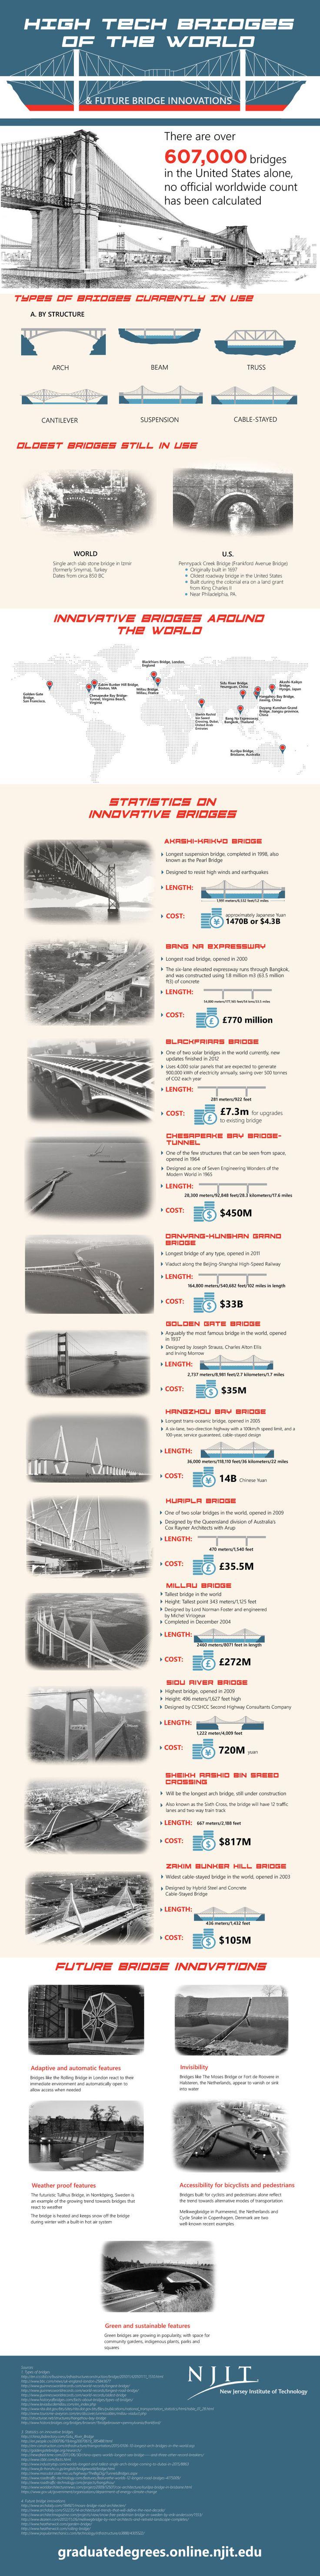 High Tech Bridges of the Future